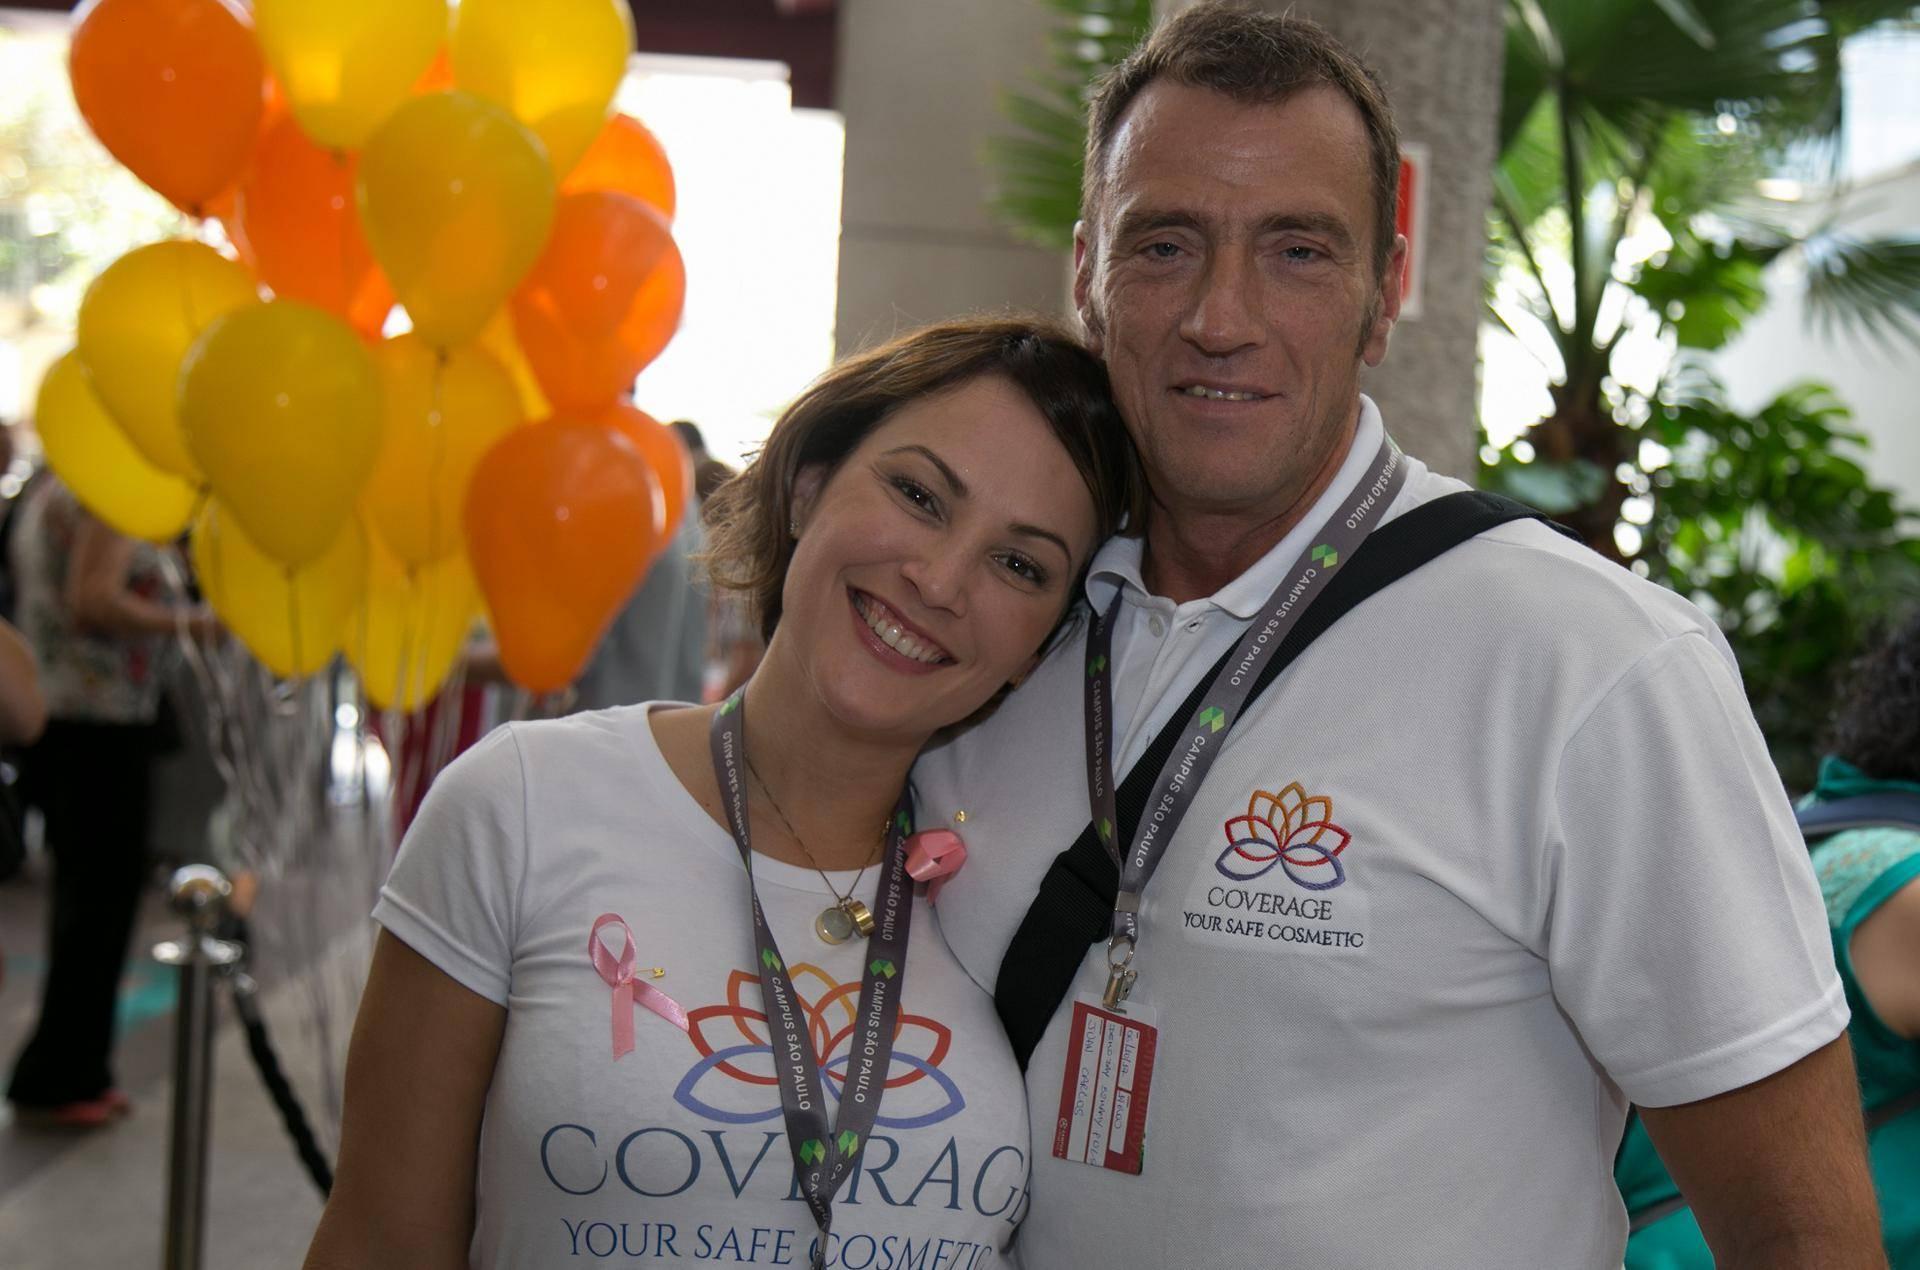 www.juicysantos.com.br - tatiana moura ceo coverage